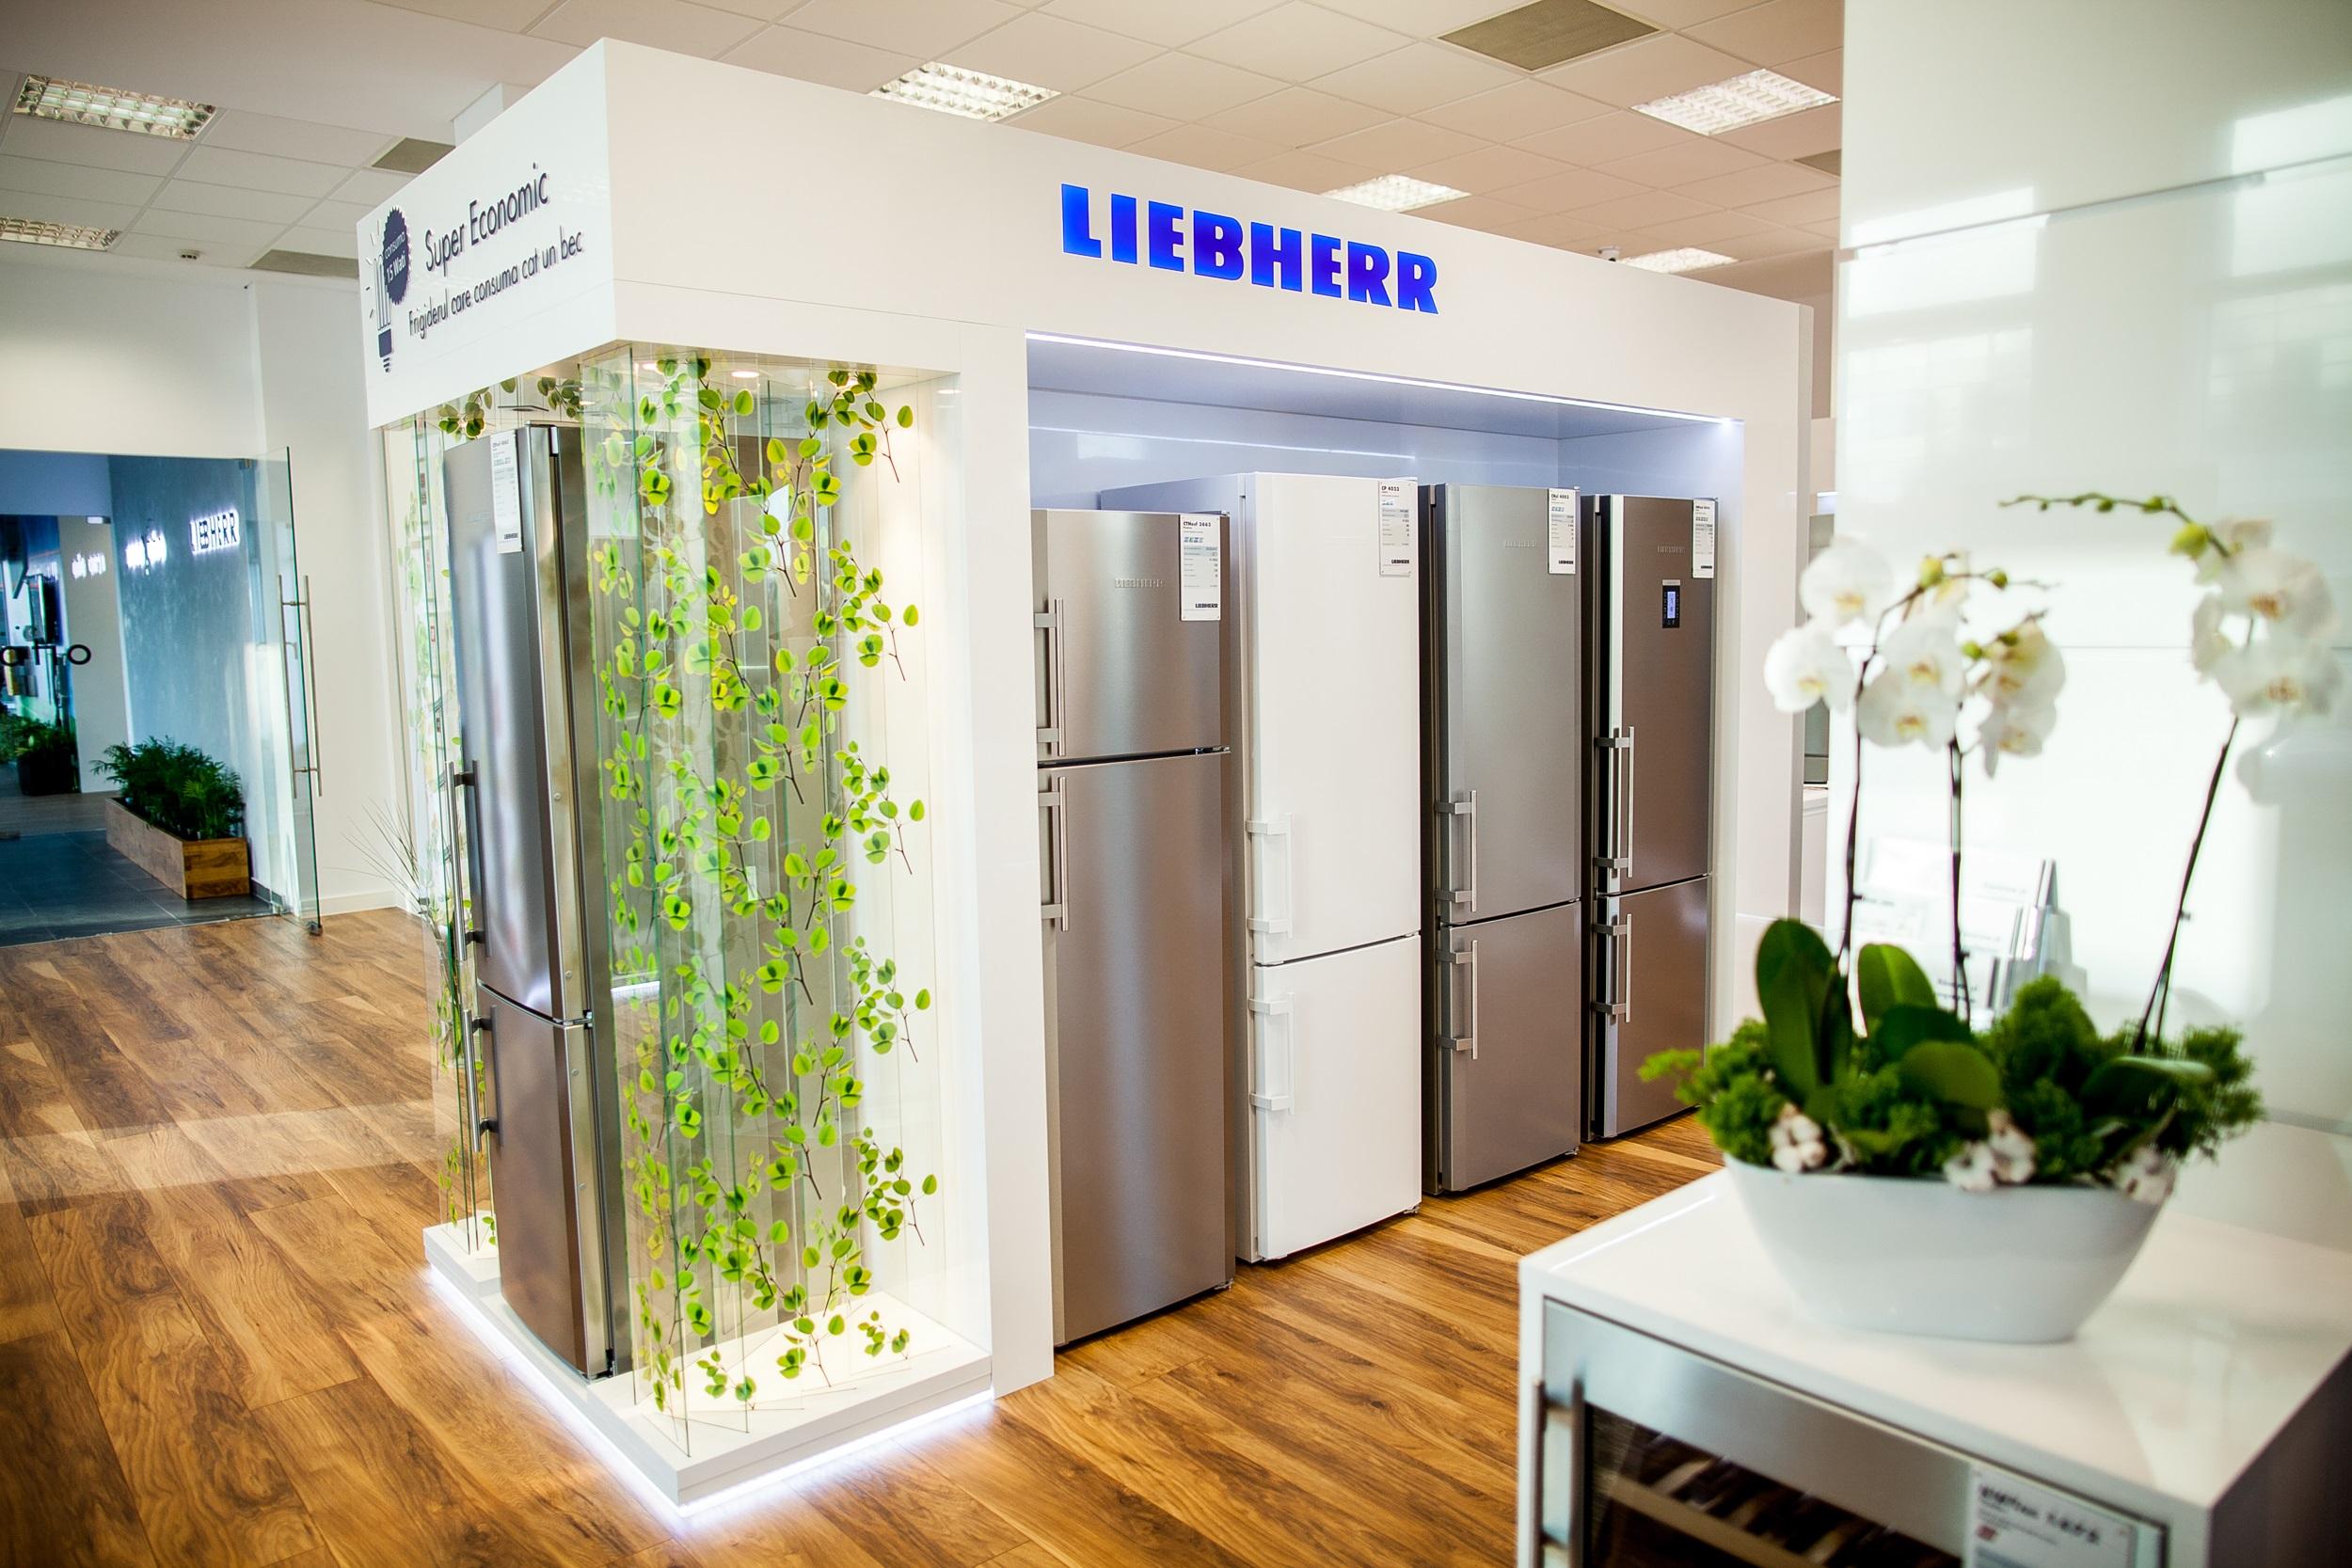 Liebherr - Totul despre mame